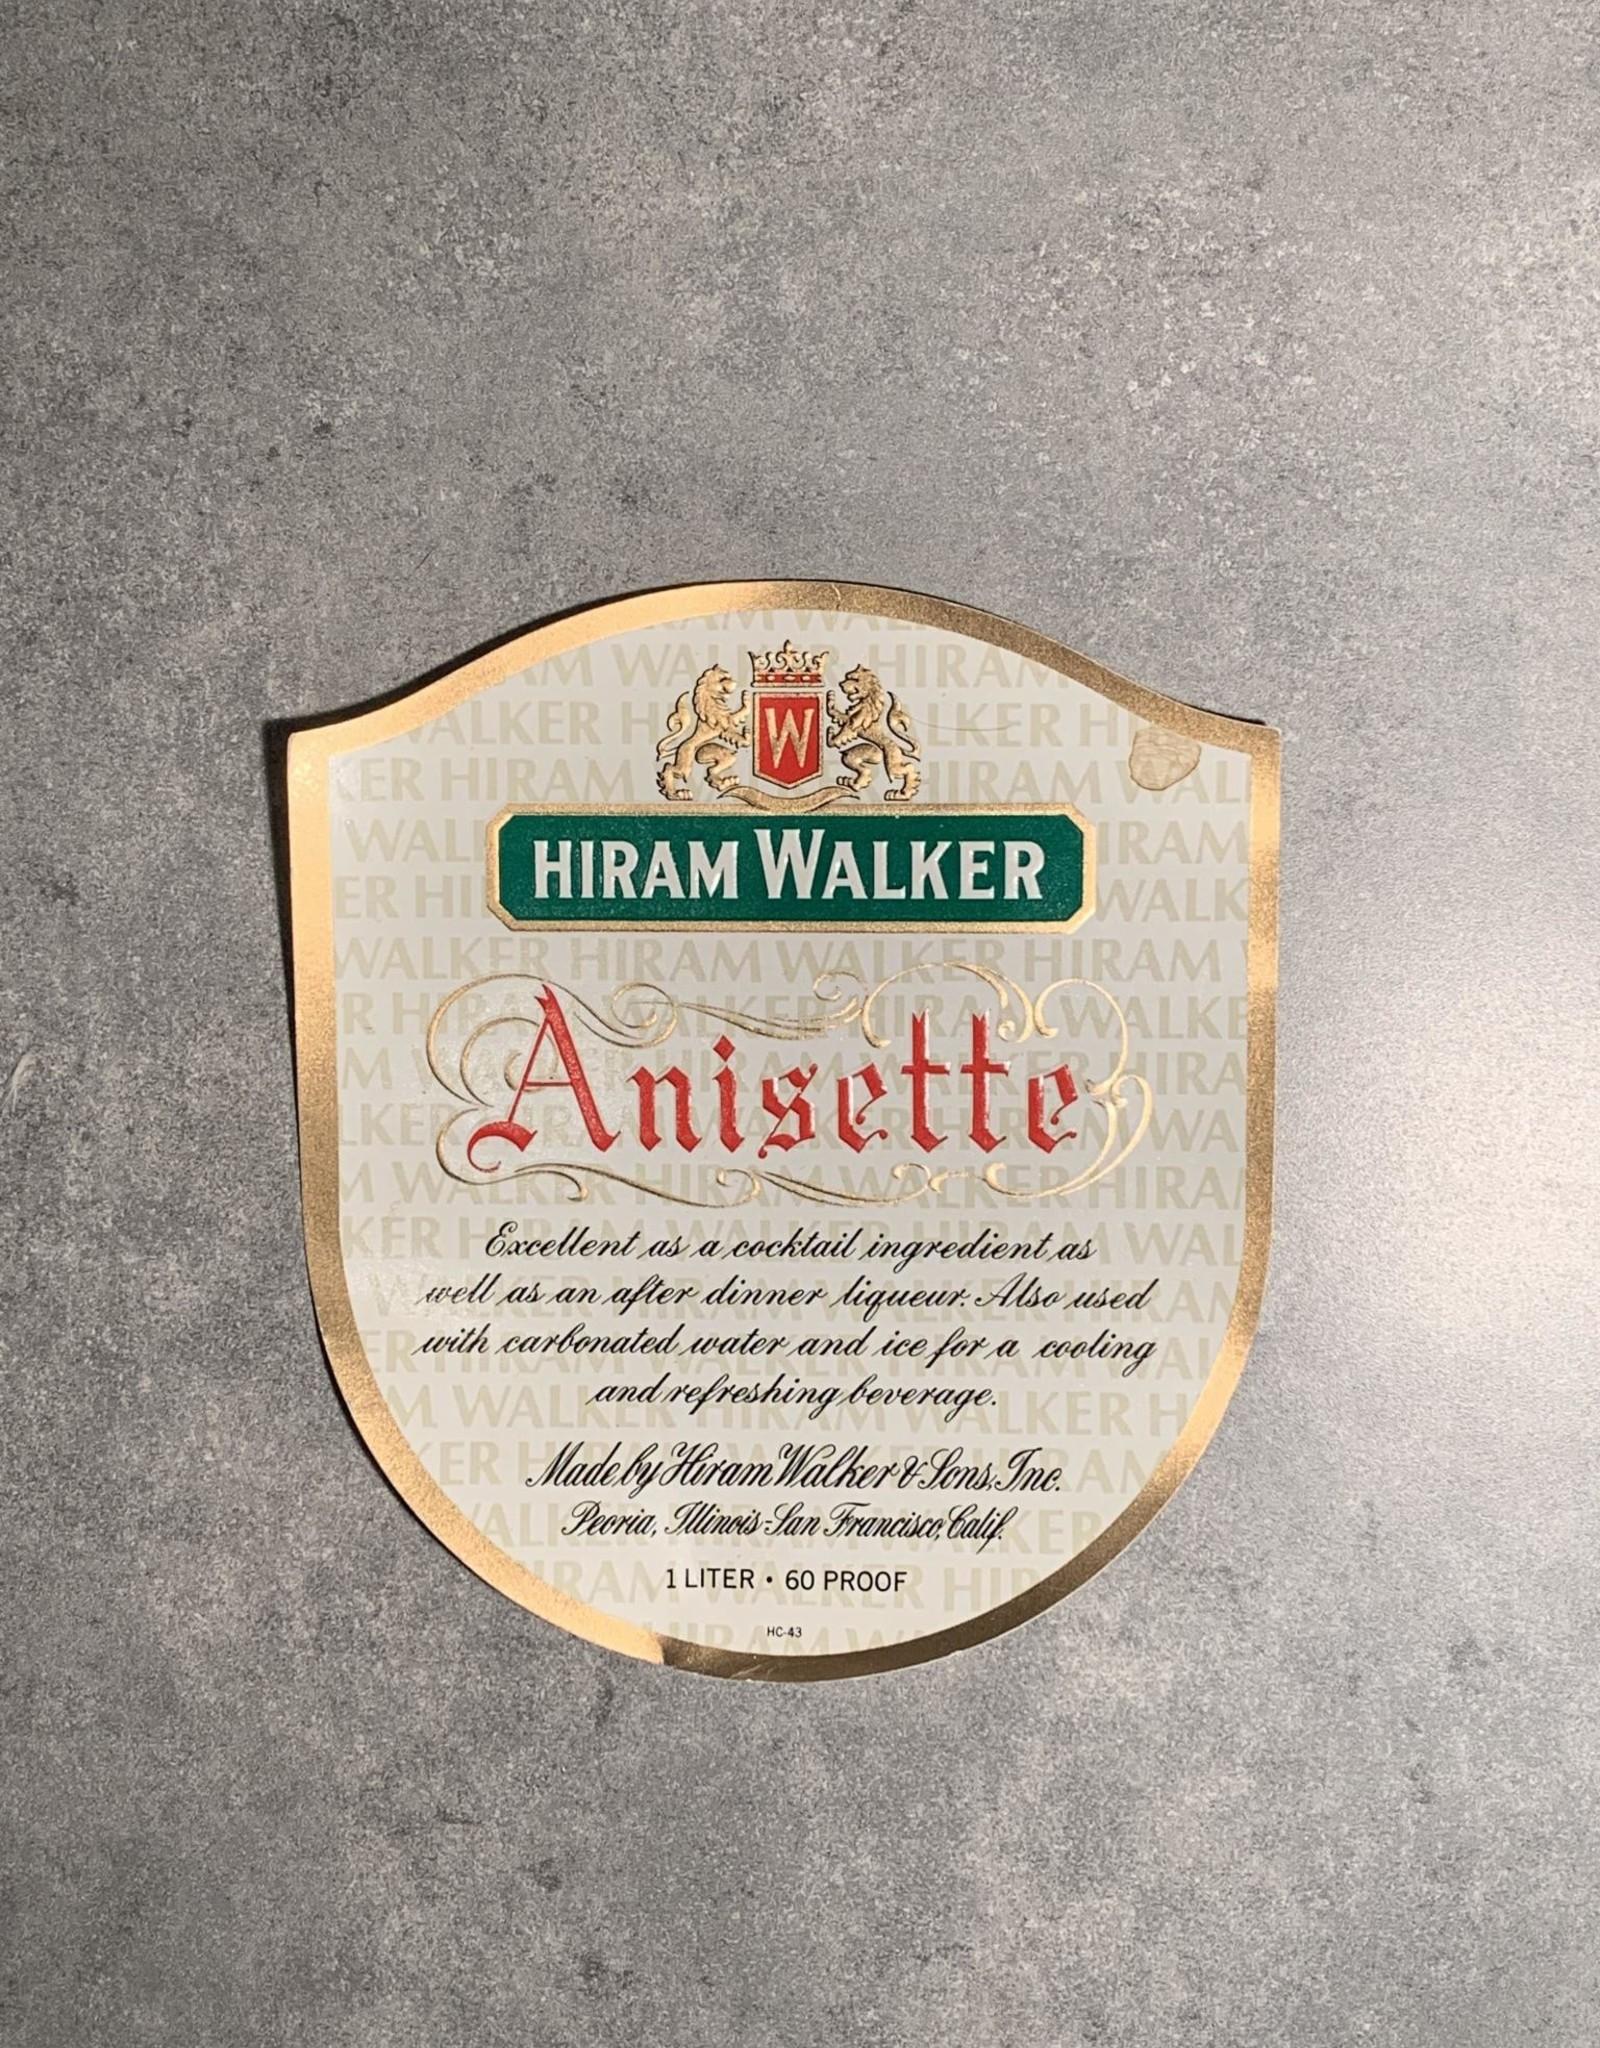 UA Merch Hiram Walker & Sons Peoria Il.  Anisette Label